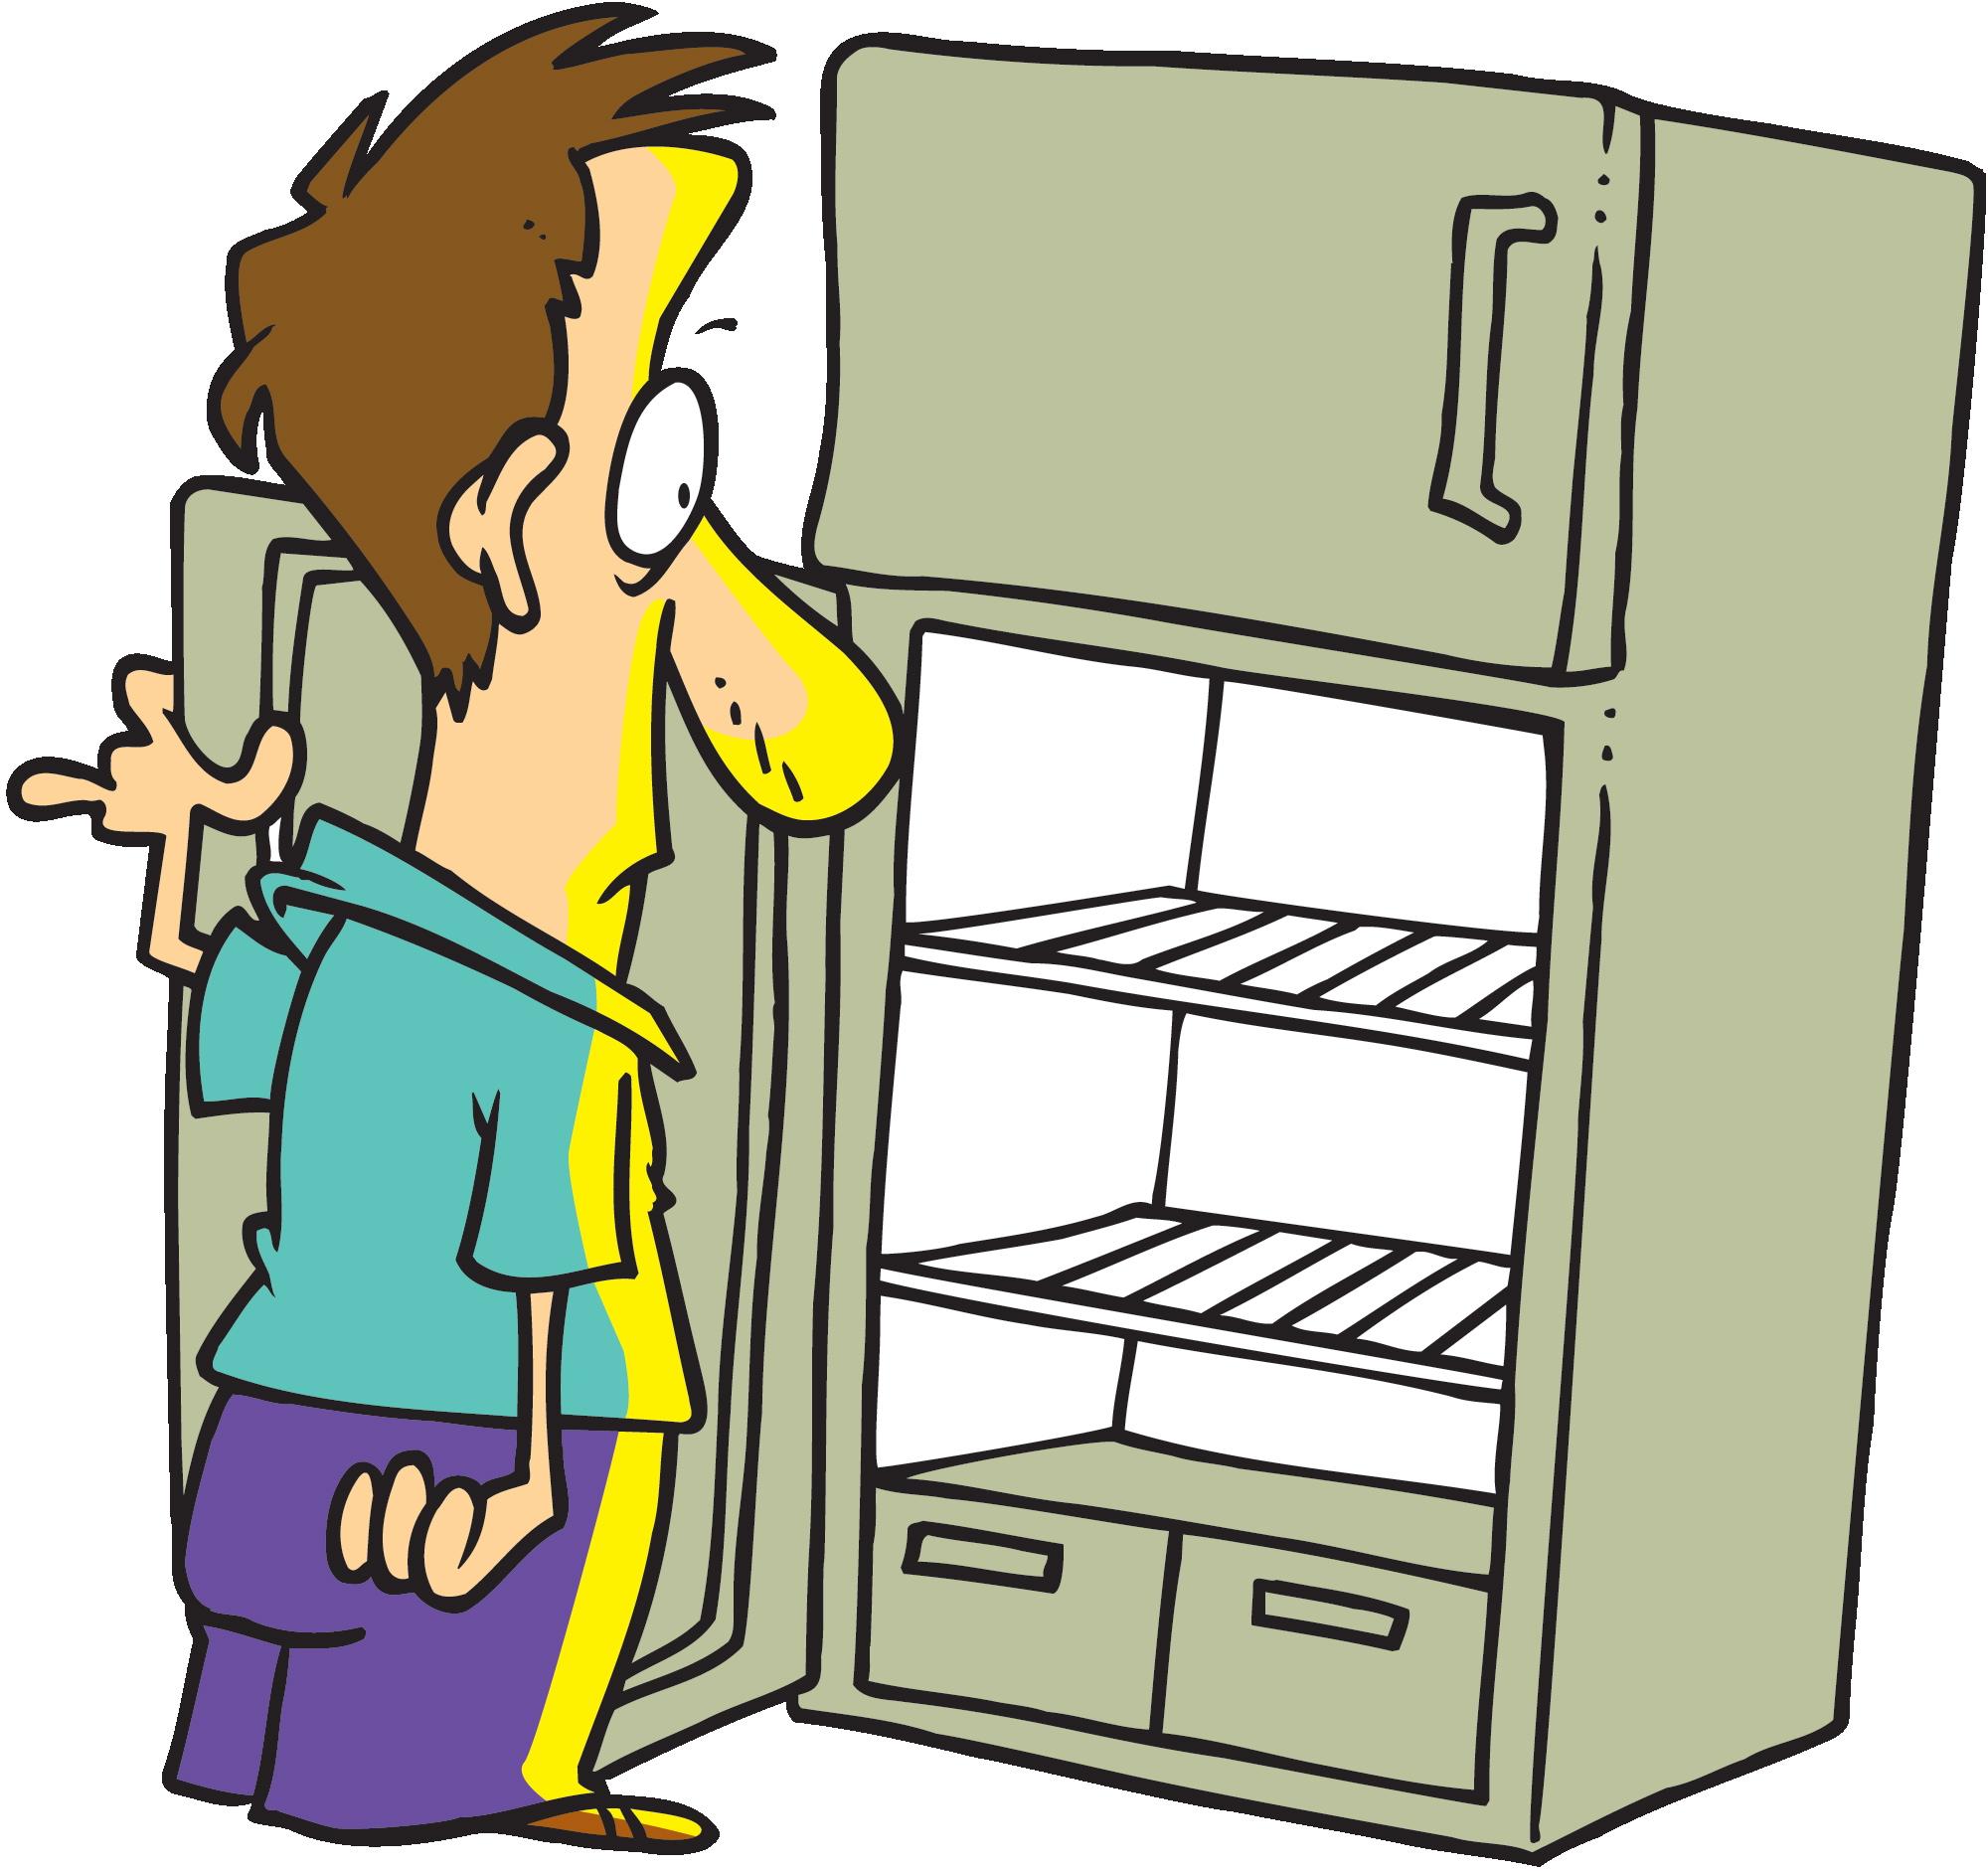 2000x1883 Empty Refrigerator Clipart